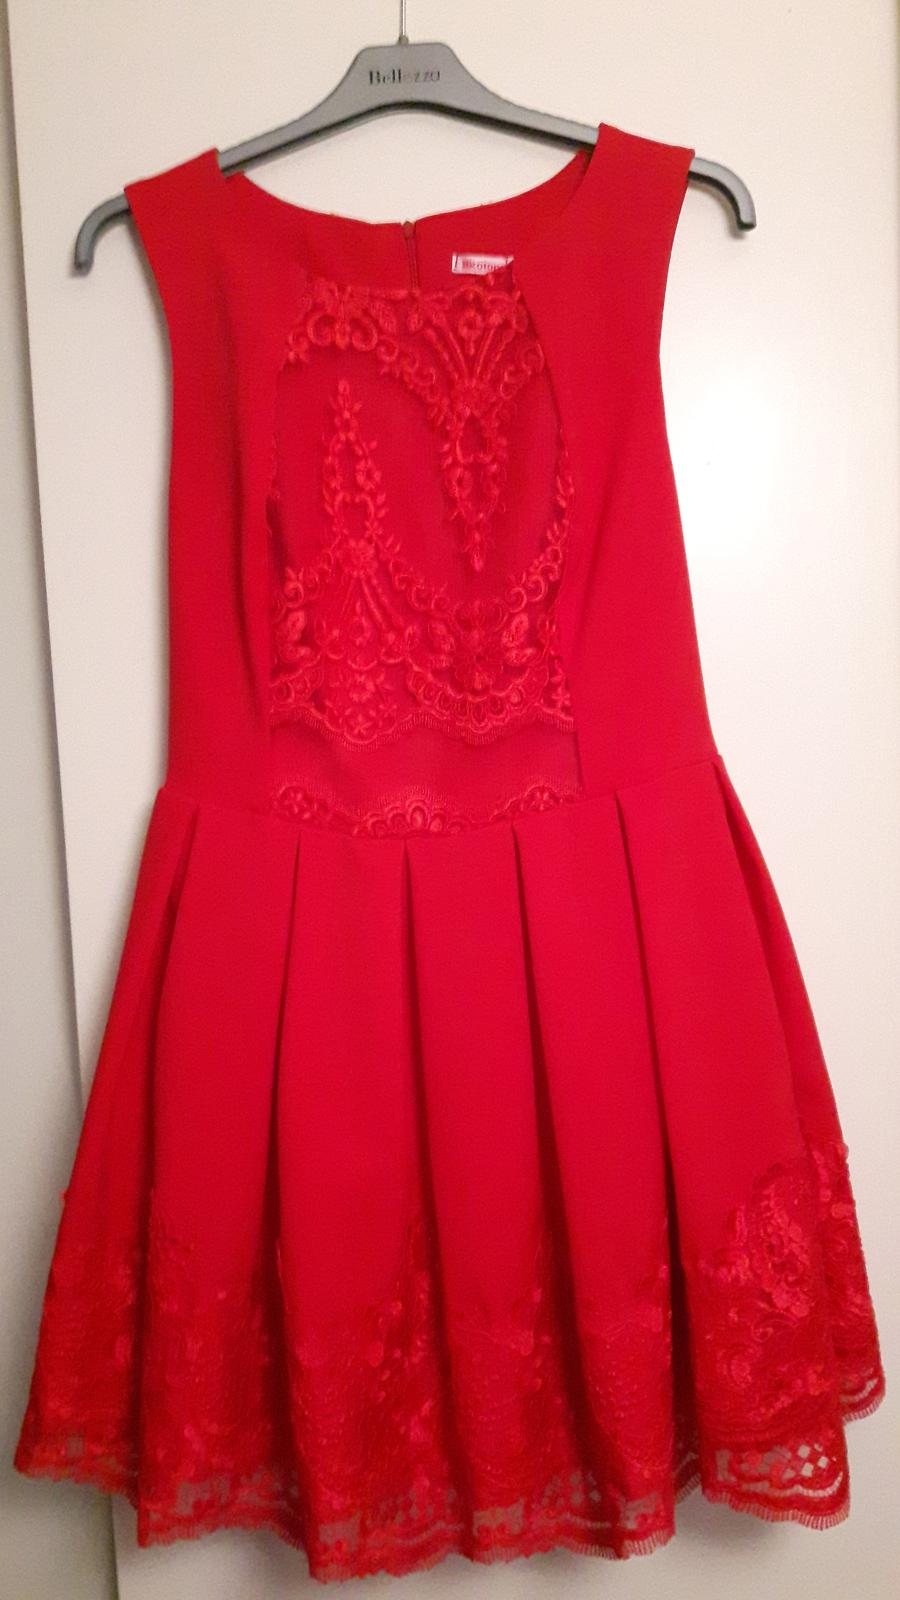 c31f950cd5dc Šaty na redový tanec